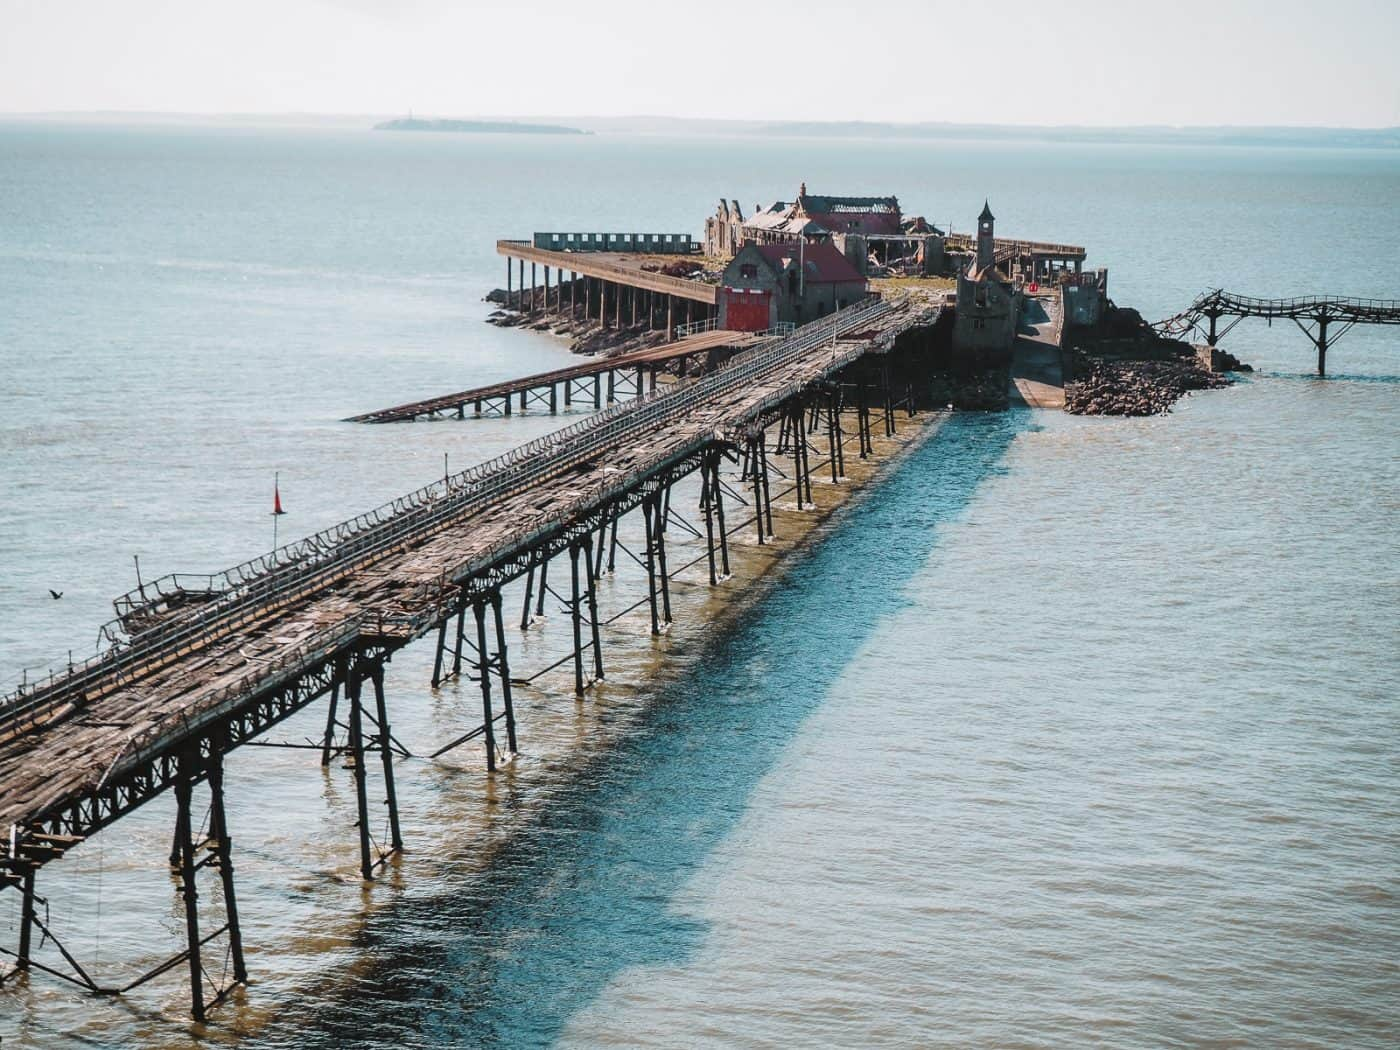 Birnbeck Pier Weston-super-Mare abandoned